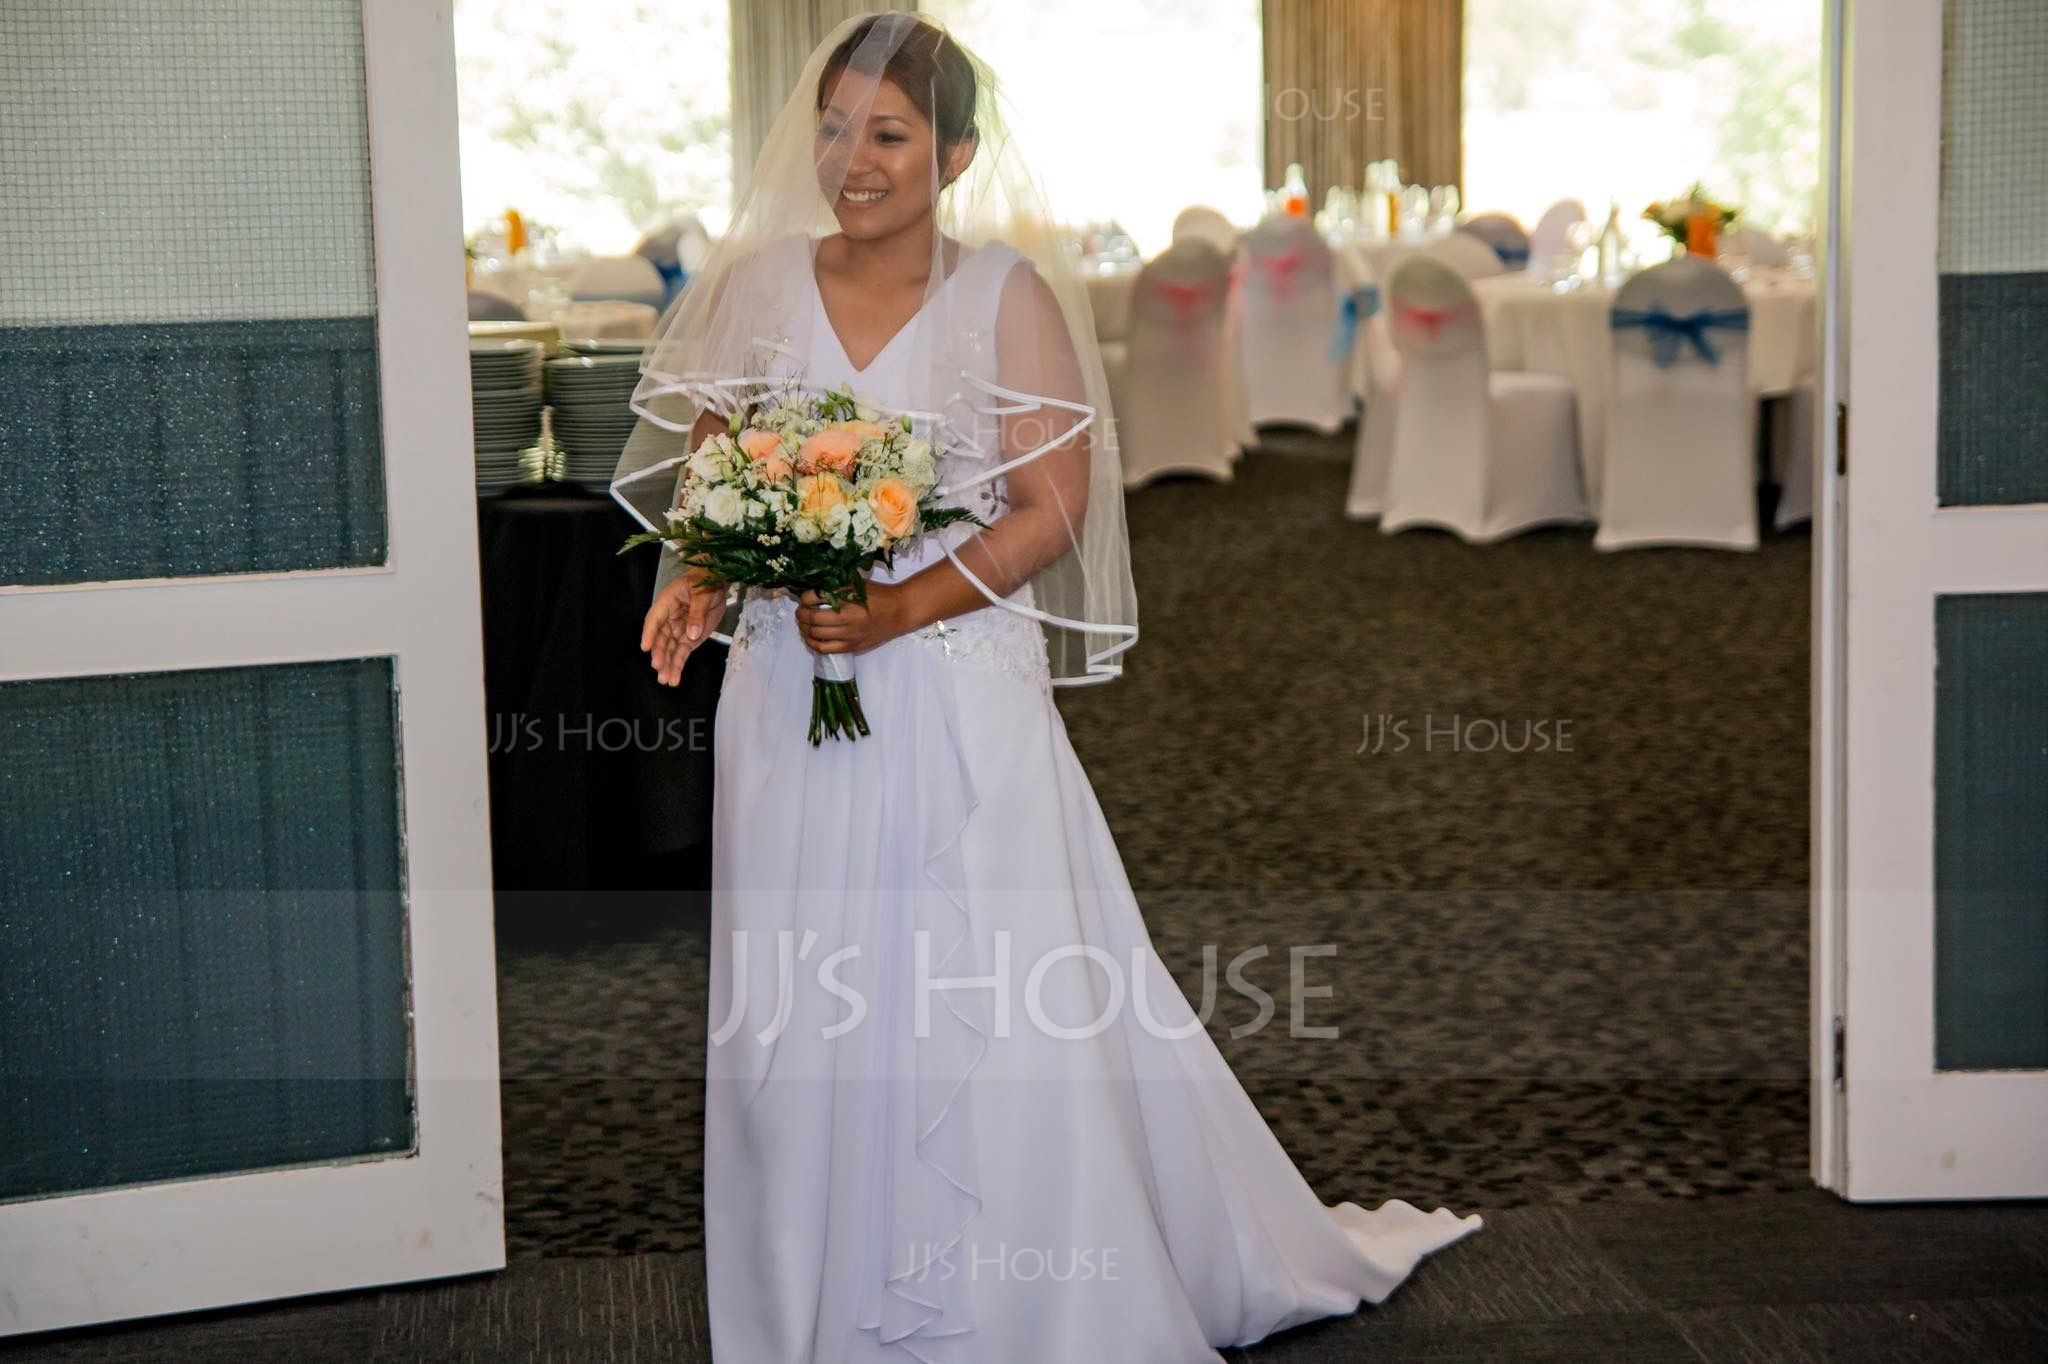 A-Line/Princess V-neck Court Train Chiffon Wedding Dress With Beading Appliques Lace Sequins Cascading Ruffles (002040421)